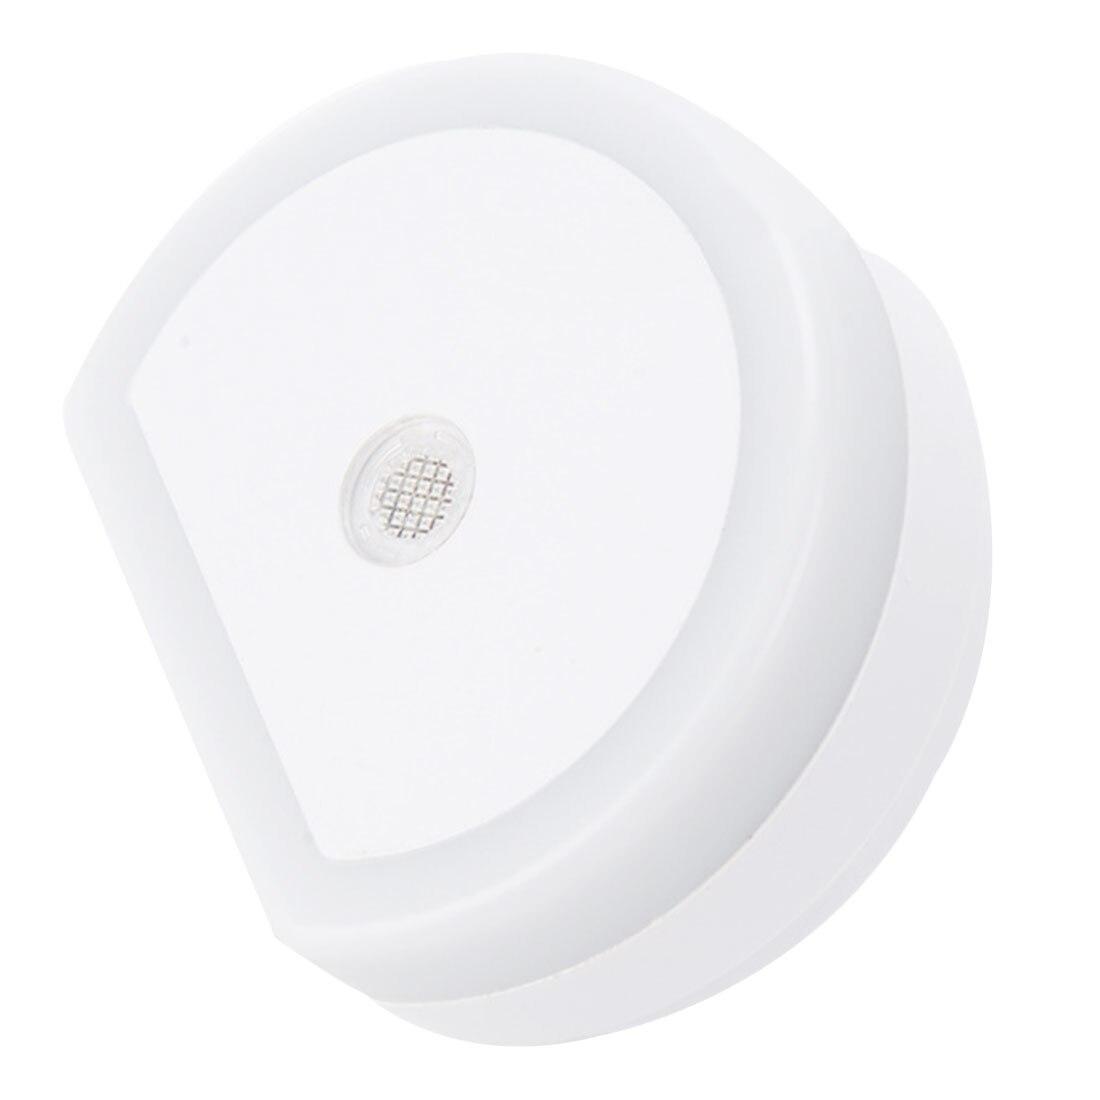 Hot LED Night Light With Dual USB Port 5V 1A Light Sensor Control Room Home Lighting Plug-in Wall Lamp EU/US Plug Socket Lamp